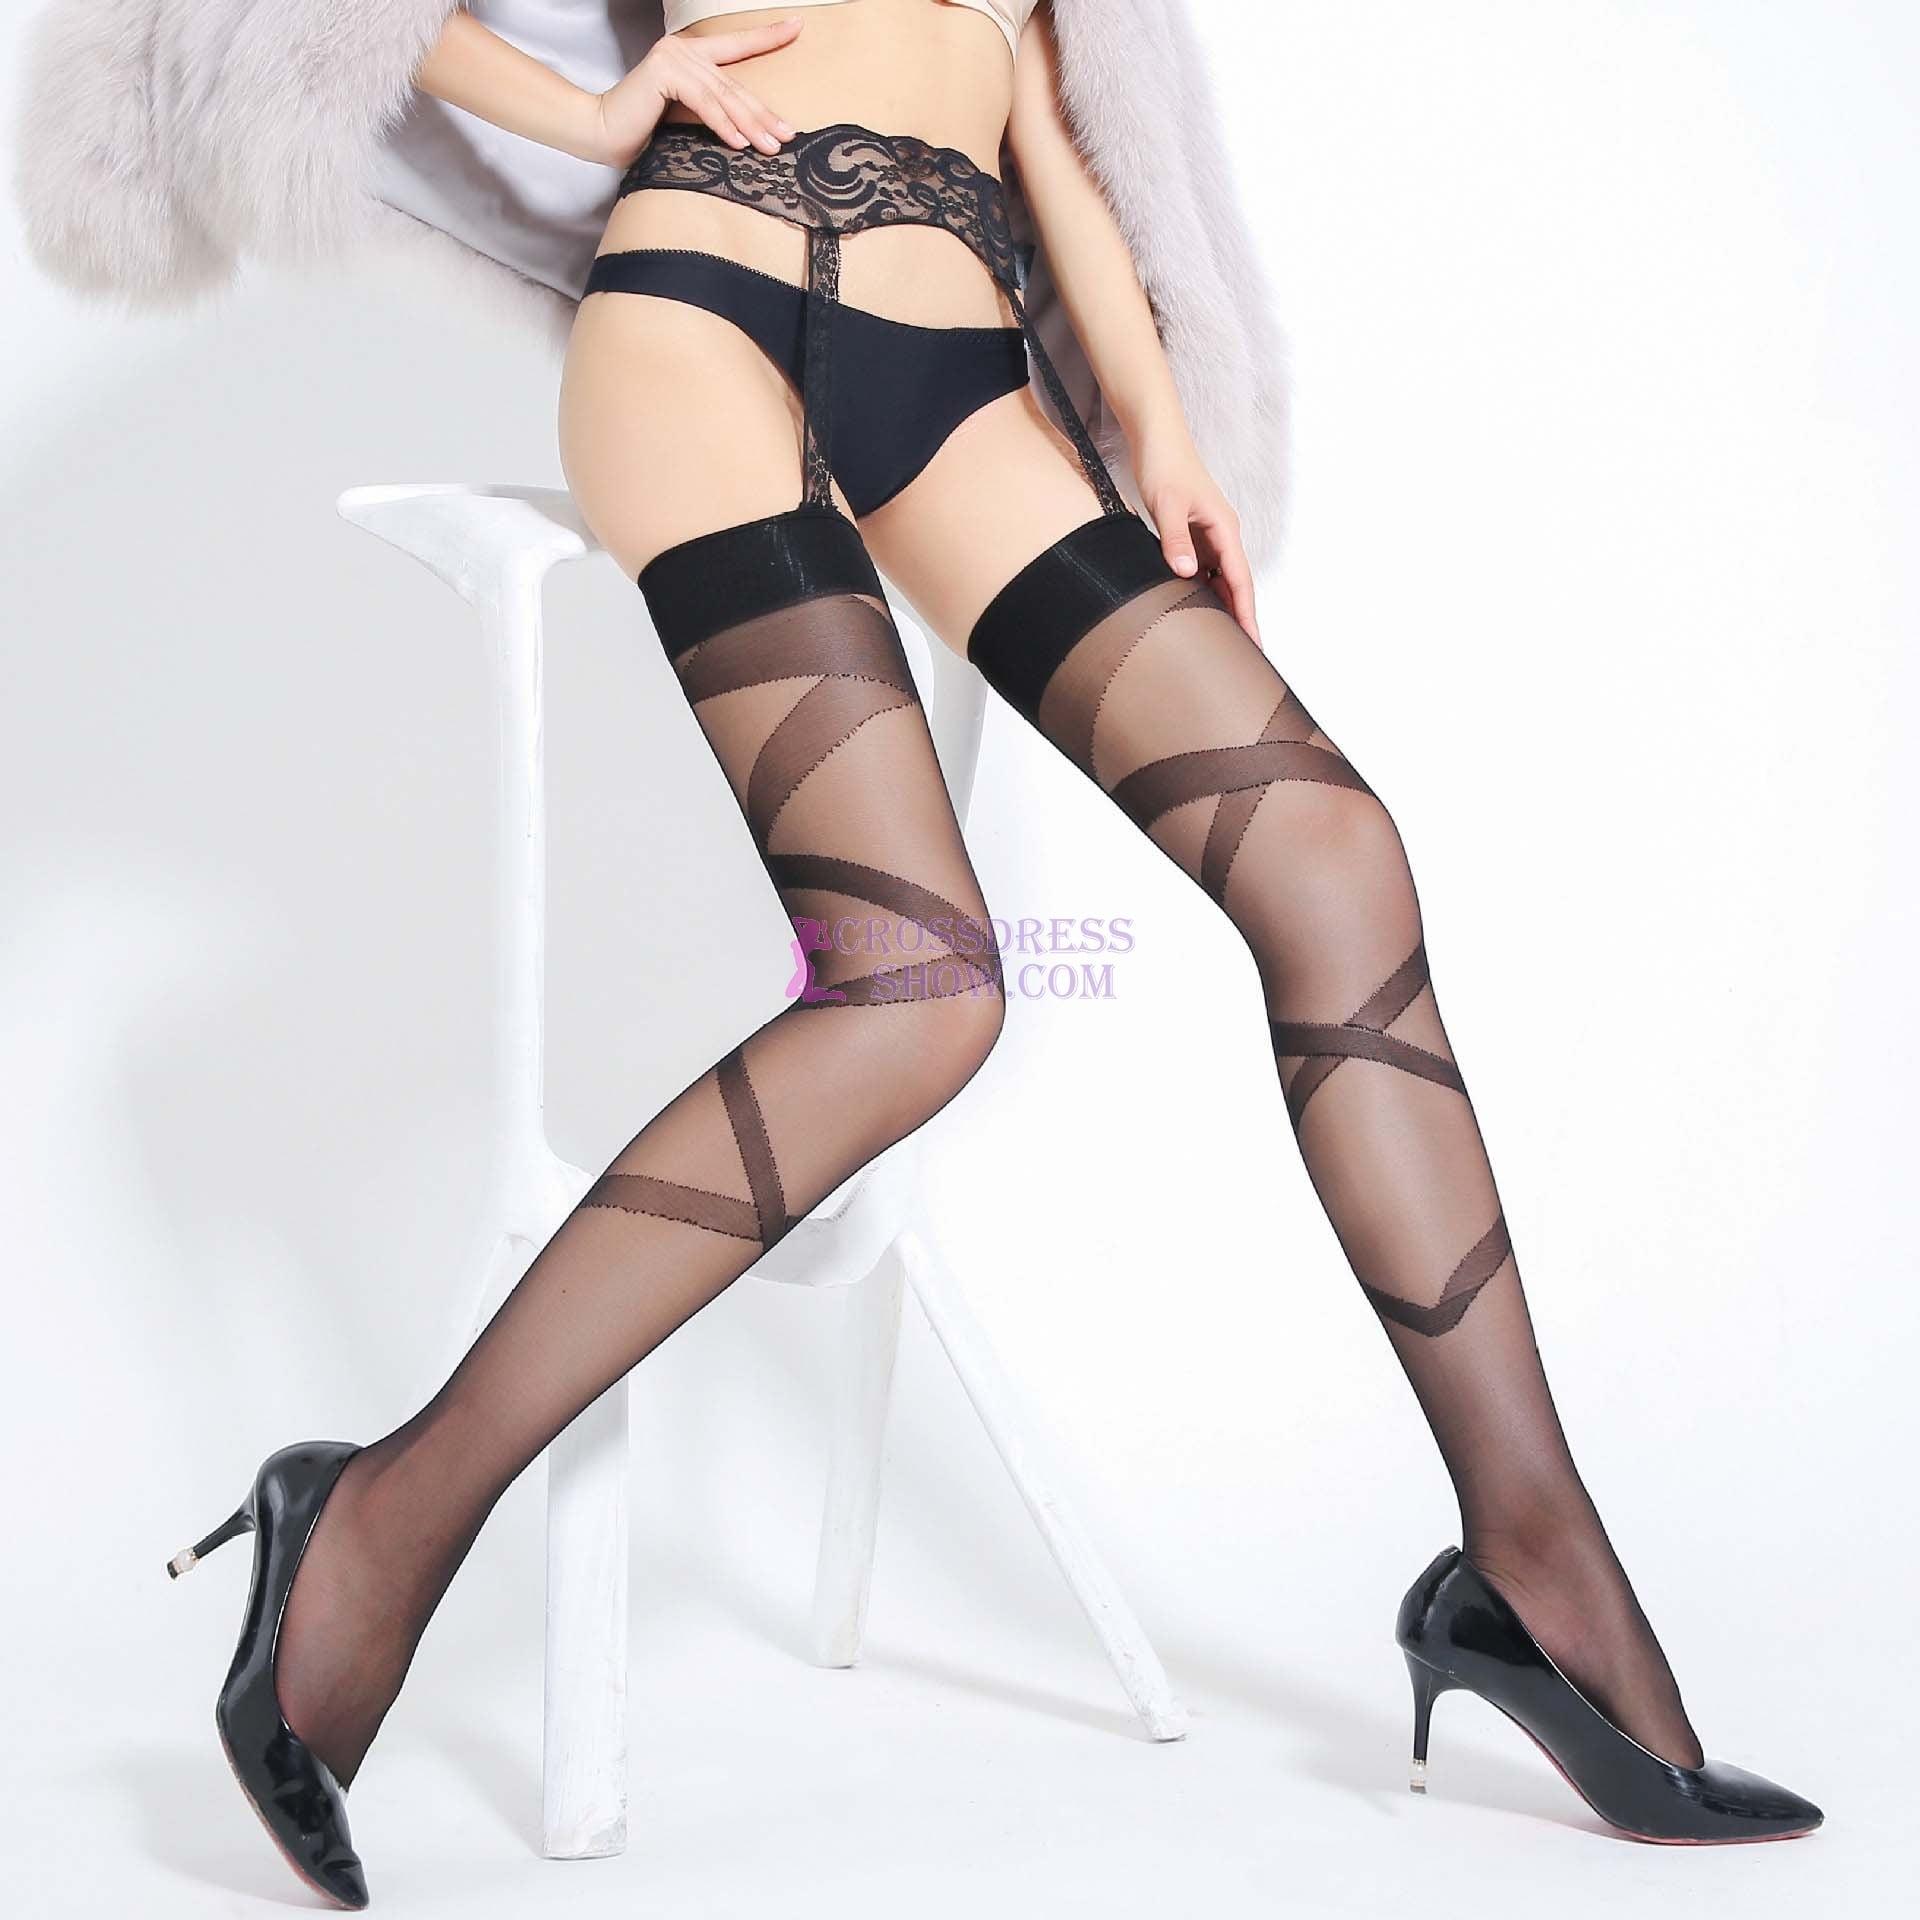 Floral Lace Garter Bundle Pantyhose 7040